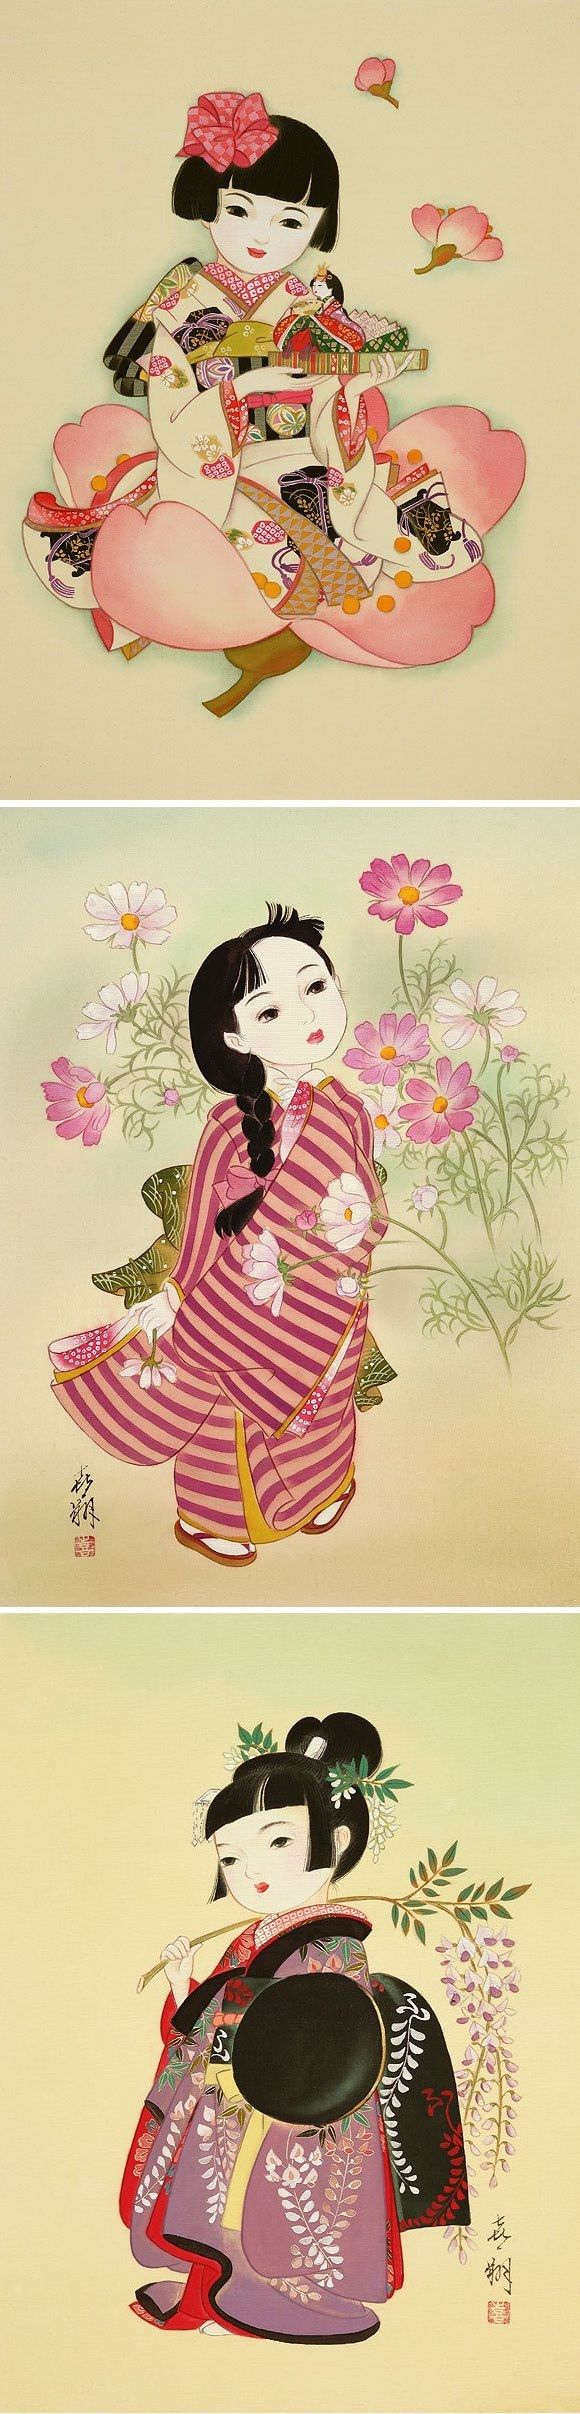 114 best ญี่ปุ่น images on Pinterest | Geishas, South korea and ...